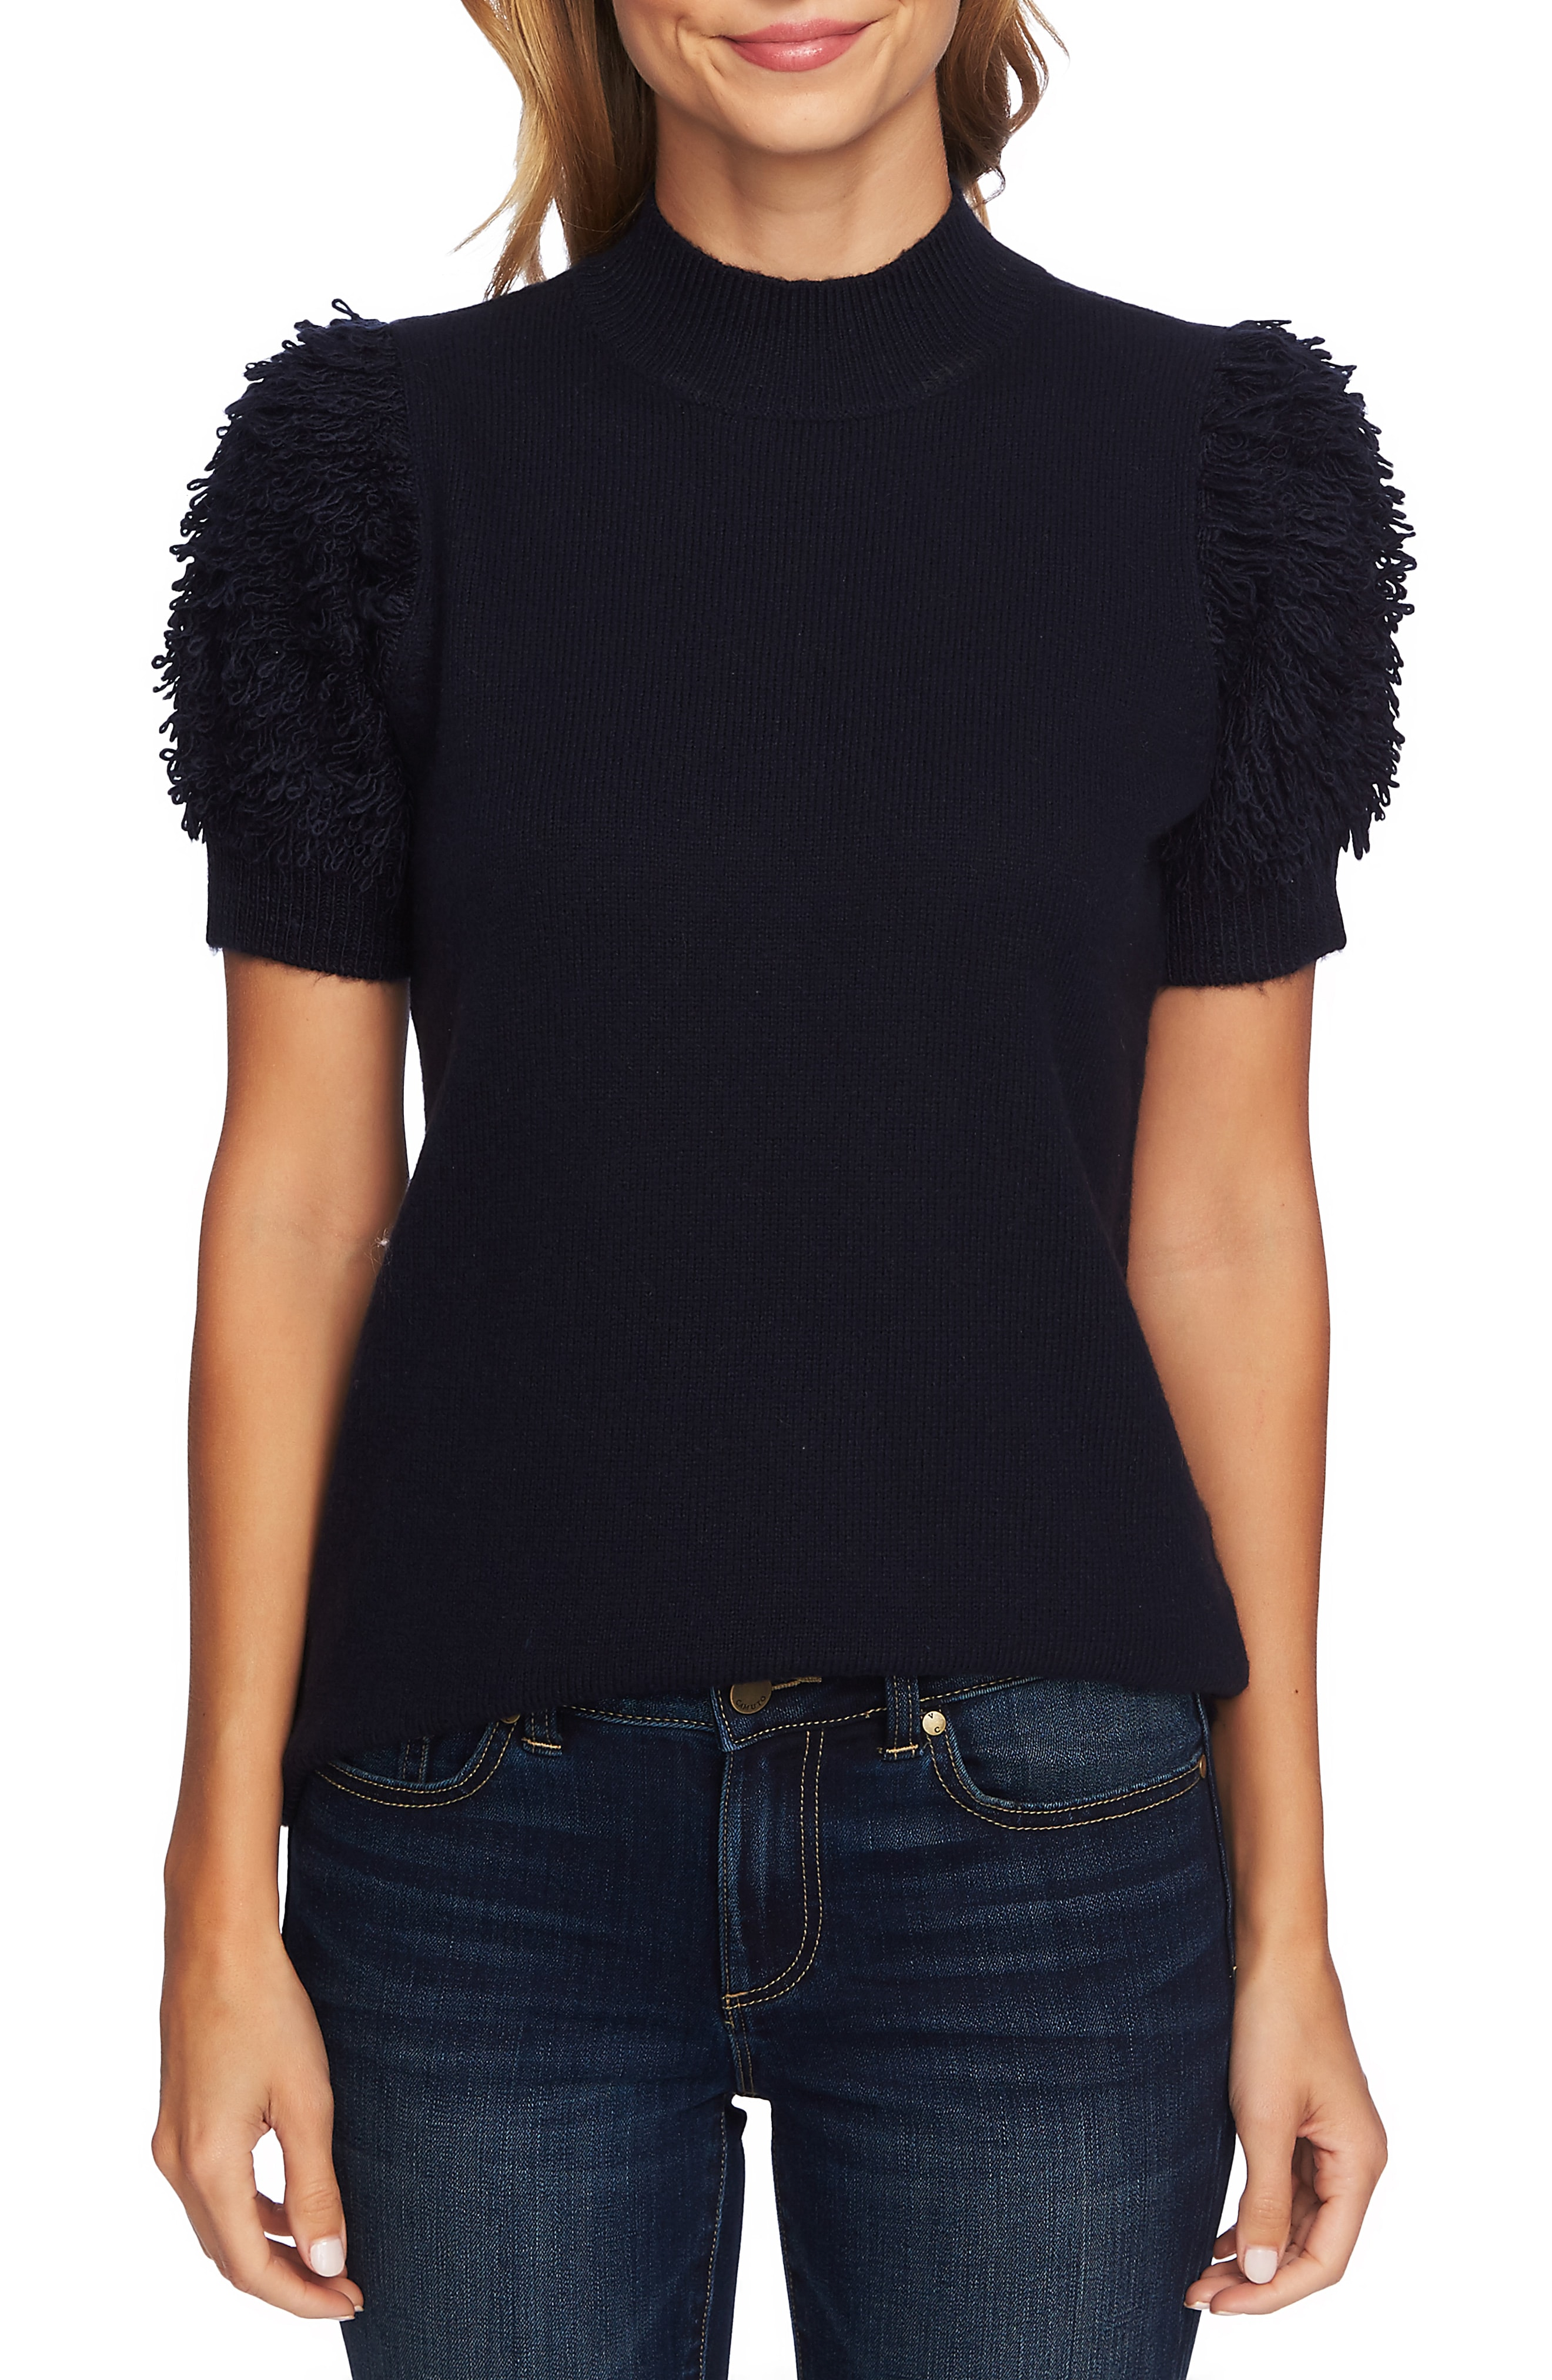 CeCe Poodle Sleeve Mock Neck Sweater